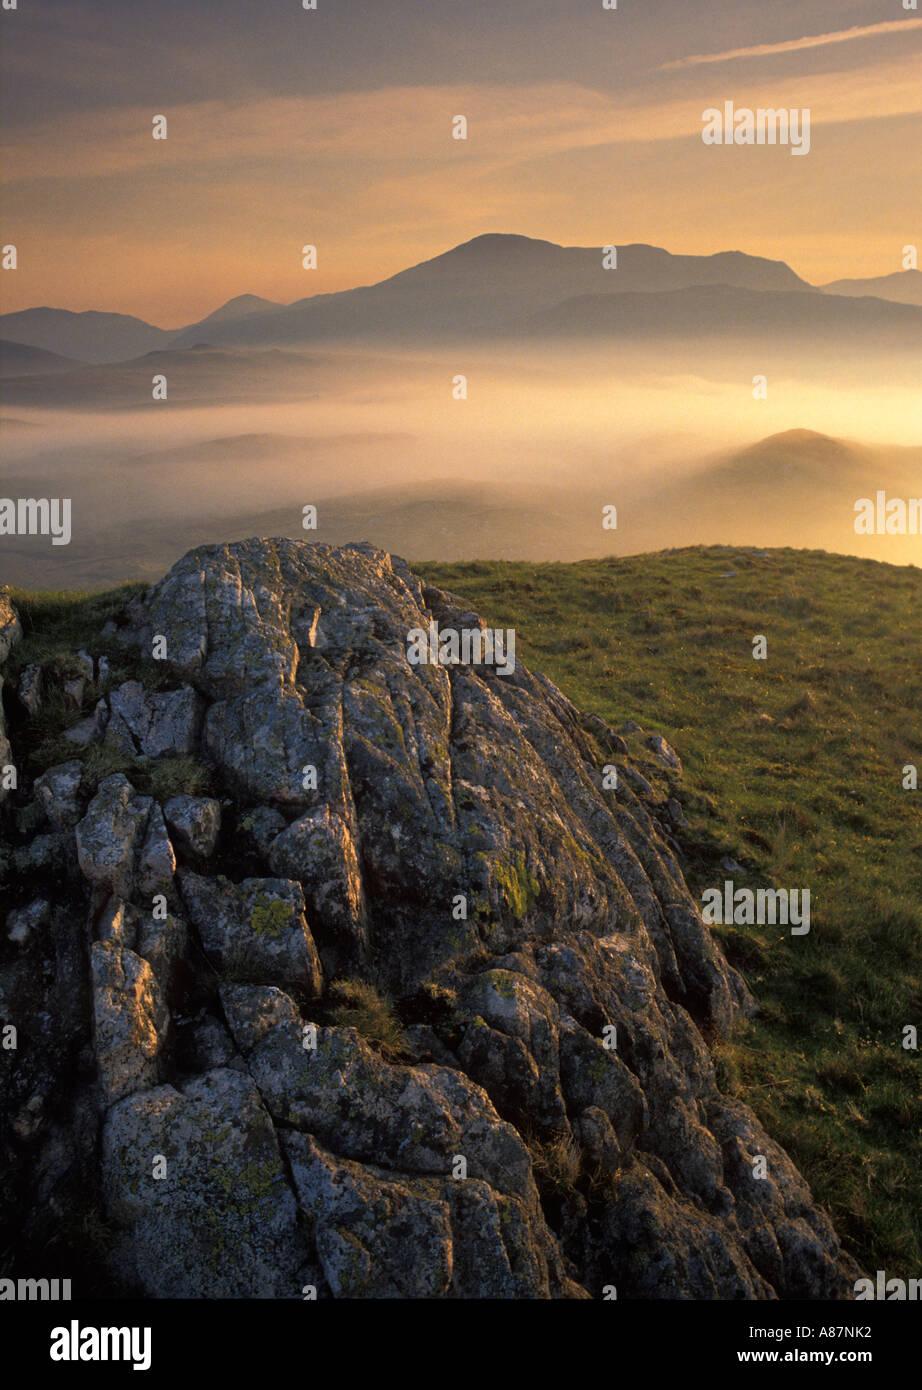 Eskdale al amanecer nr Boot Cumbria Inglaterra Imagen De Stock